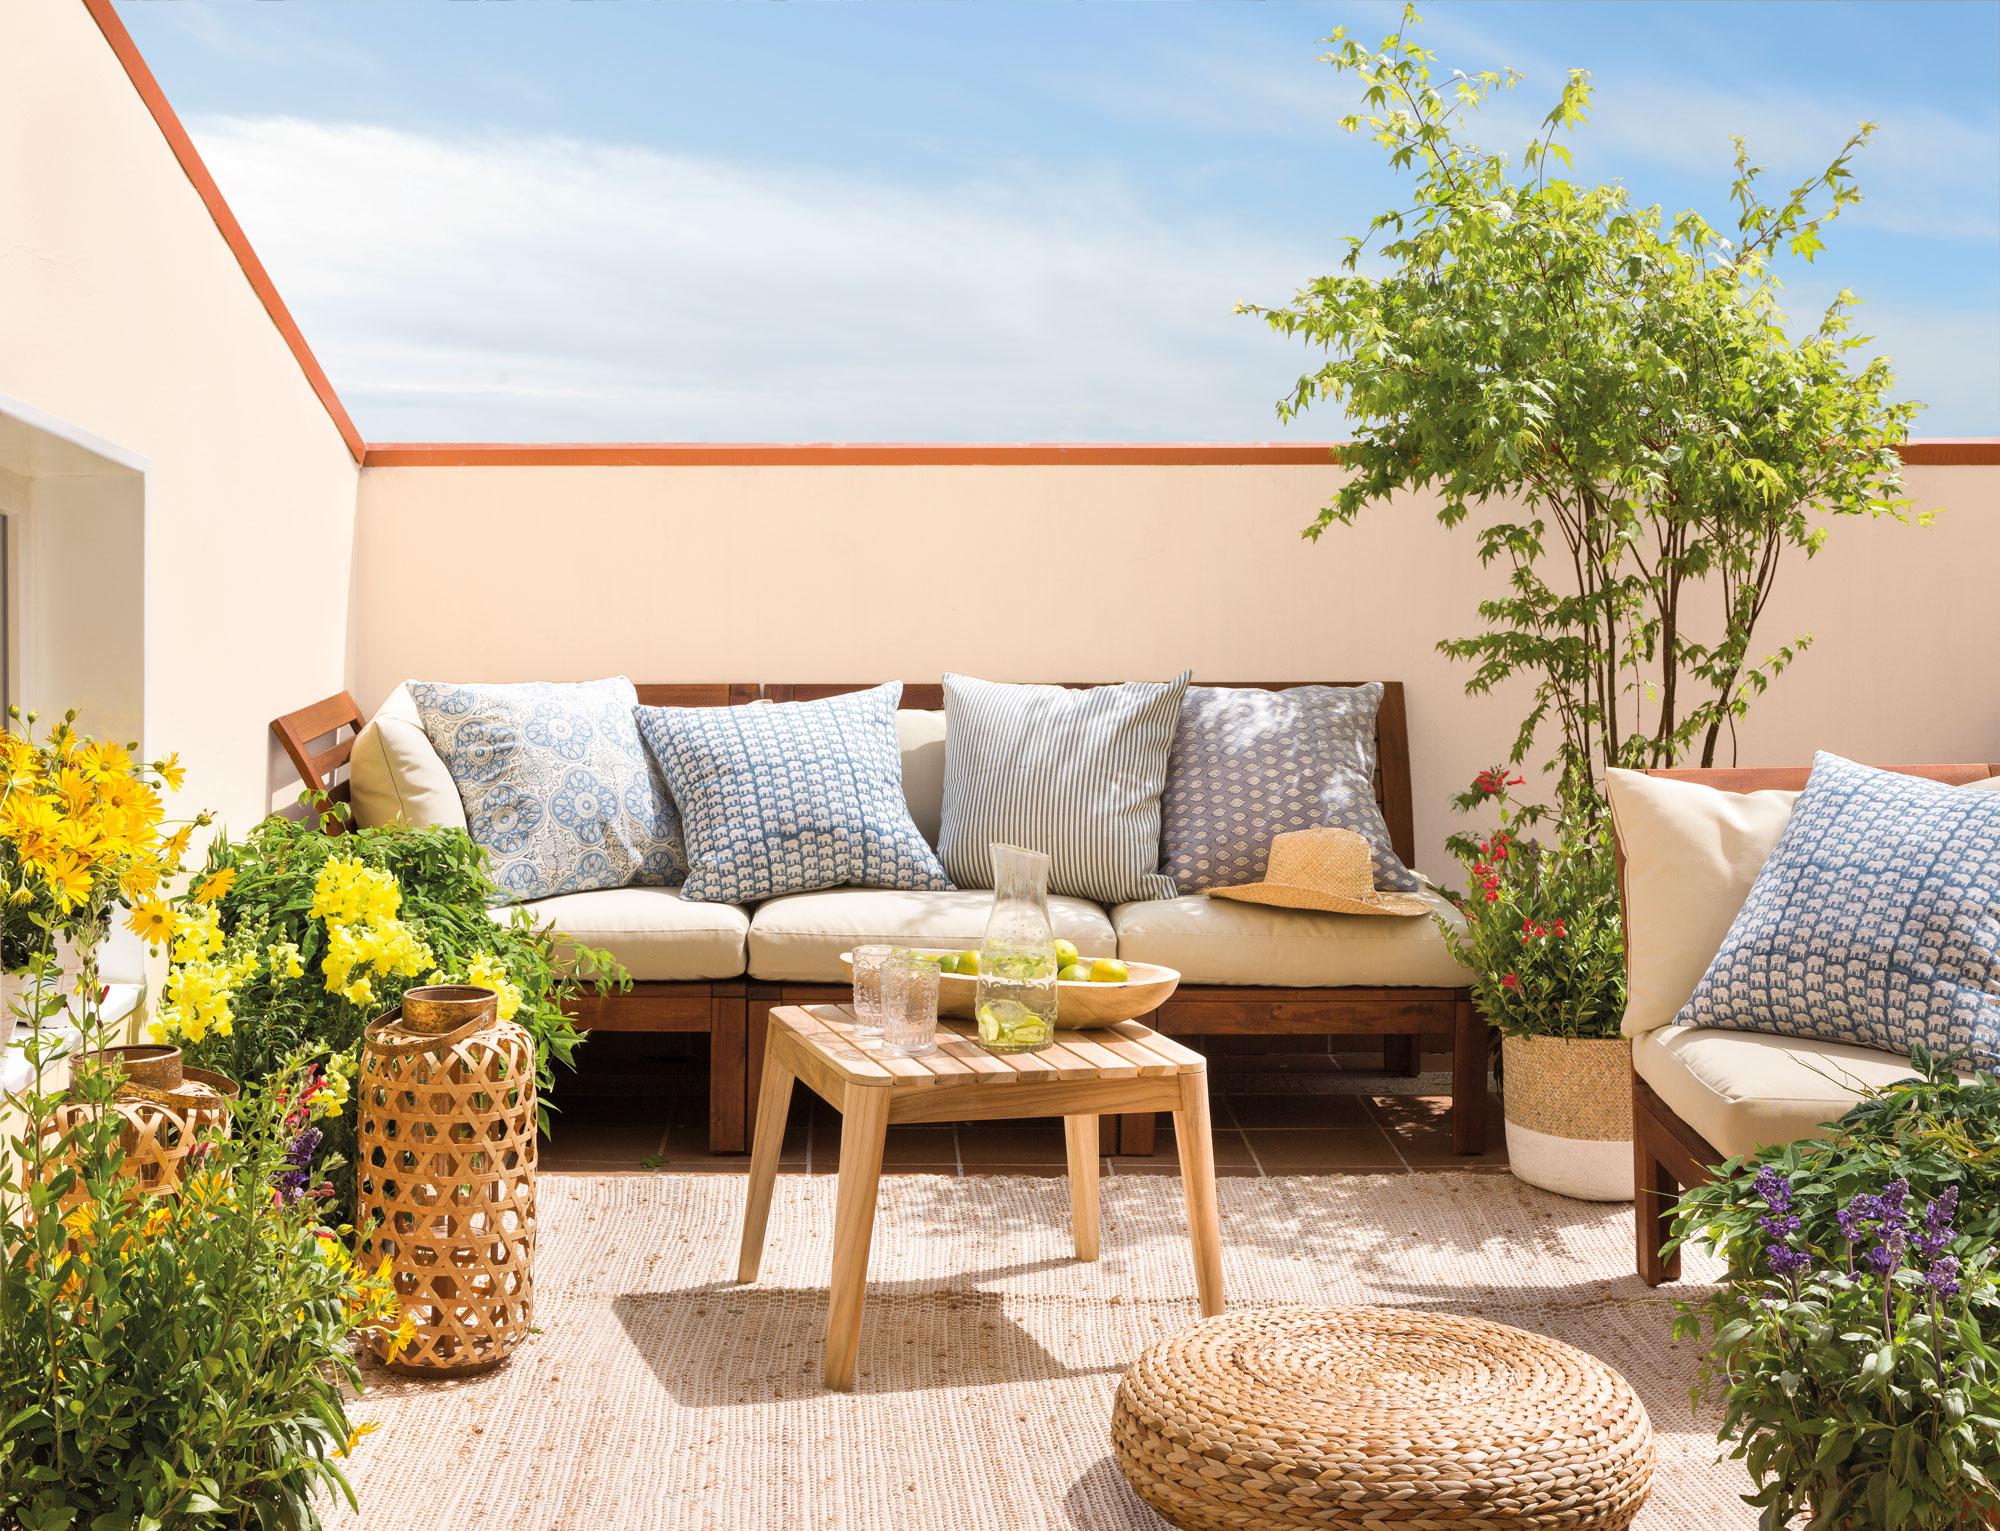 414 fotos de terrazas for Imagenes de terrazas